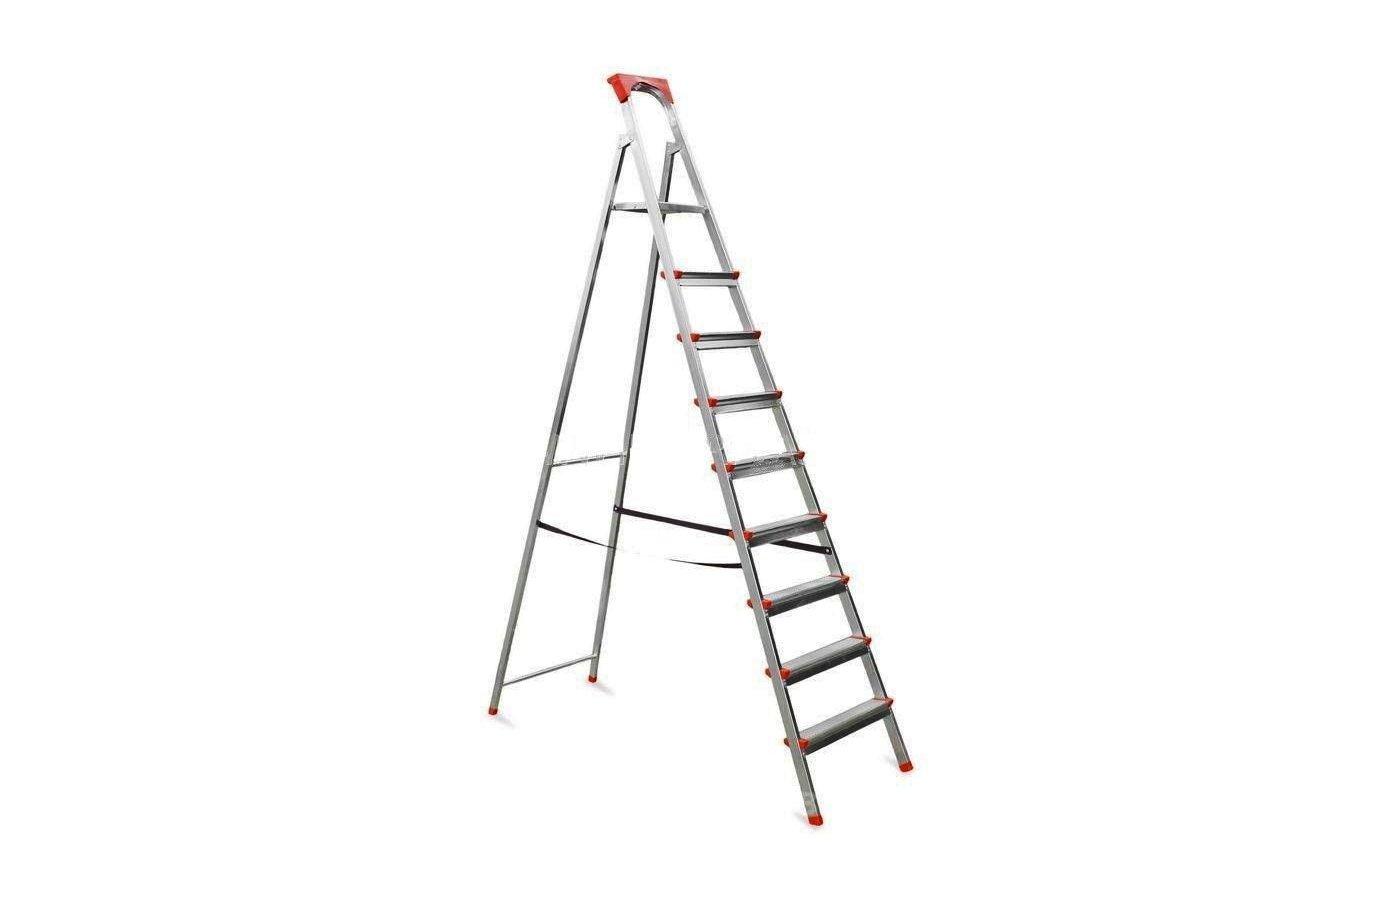 Лестница Лестница-стремянка Dogrular Ufuk 9 ступ.  195х375 см 150 кг